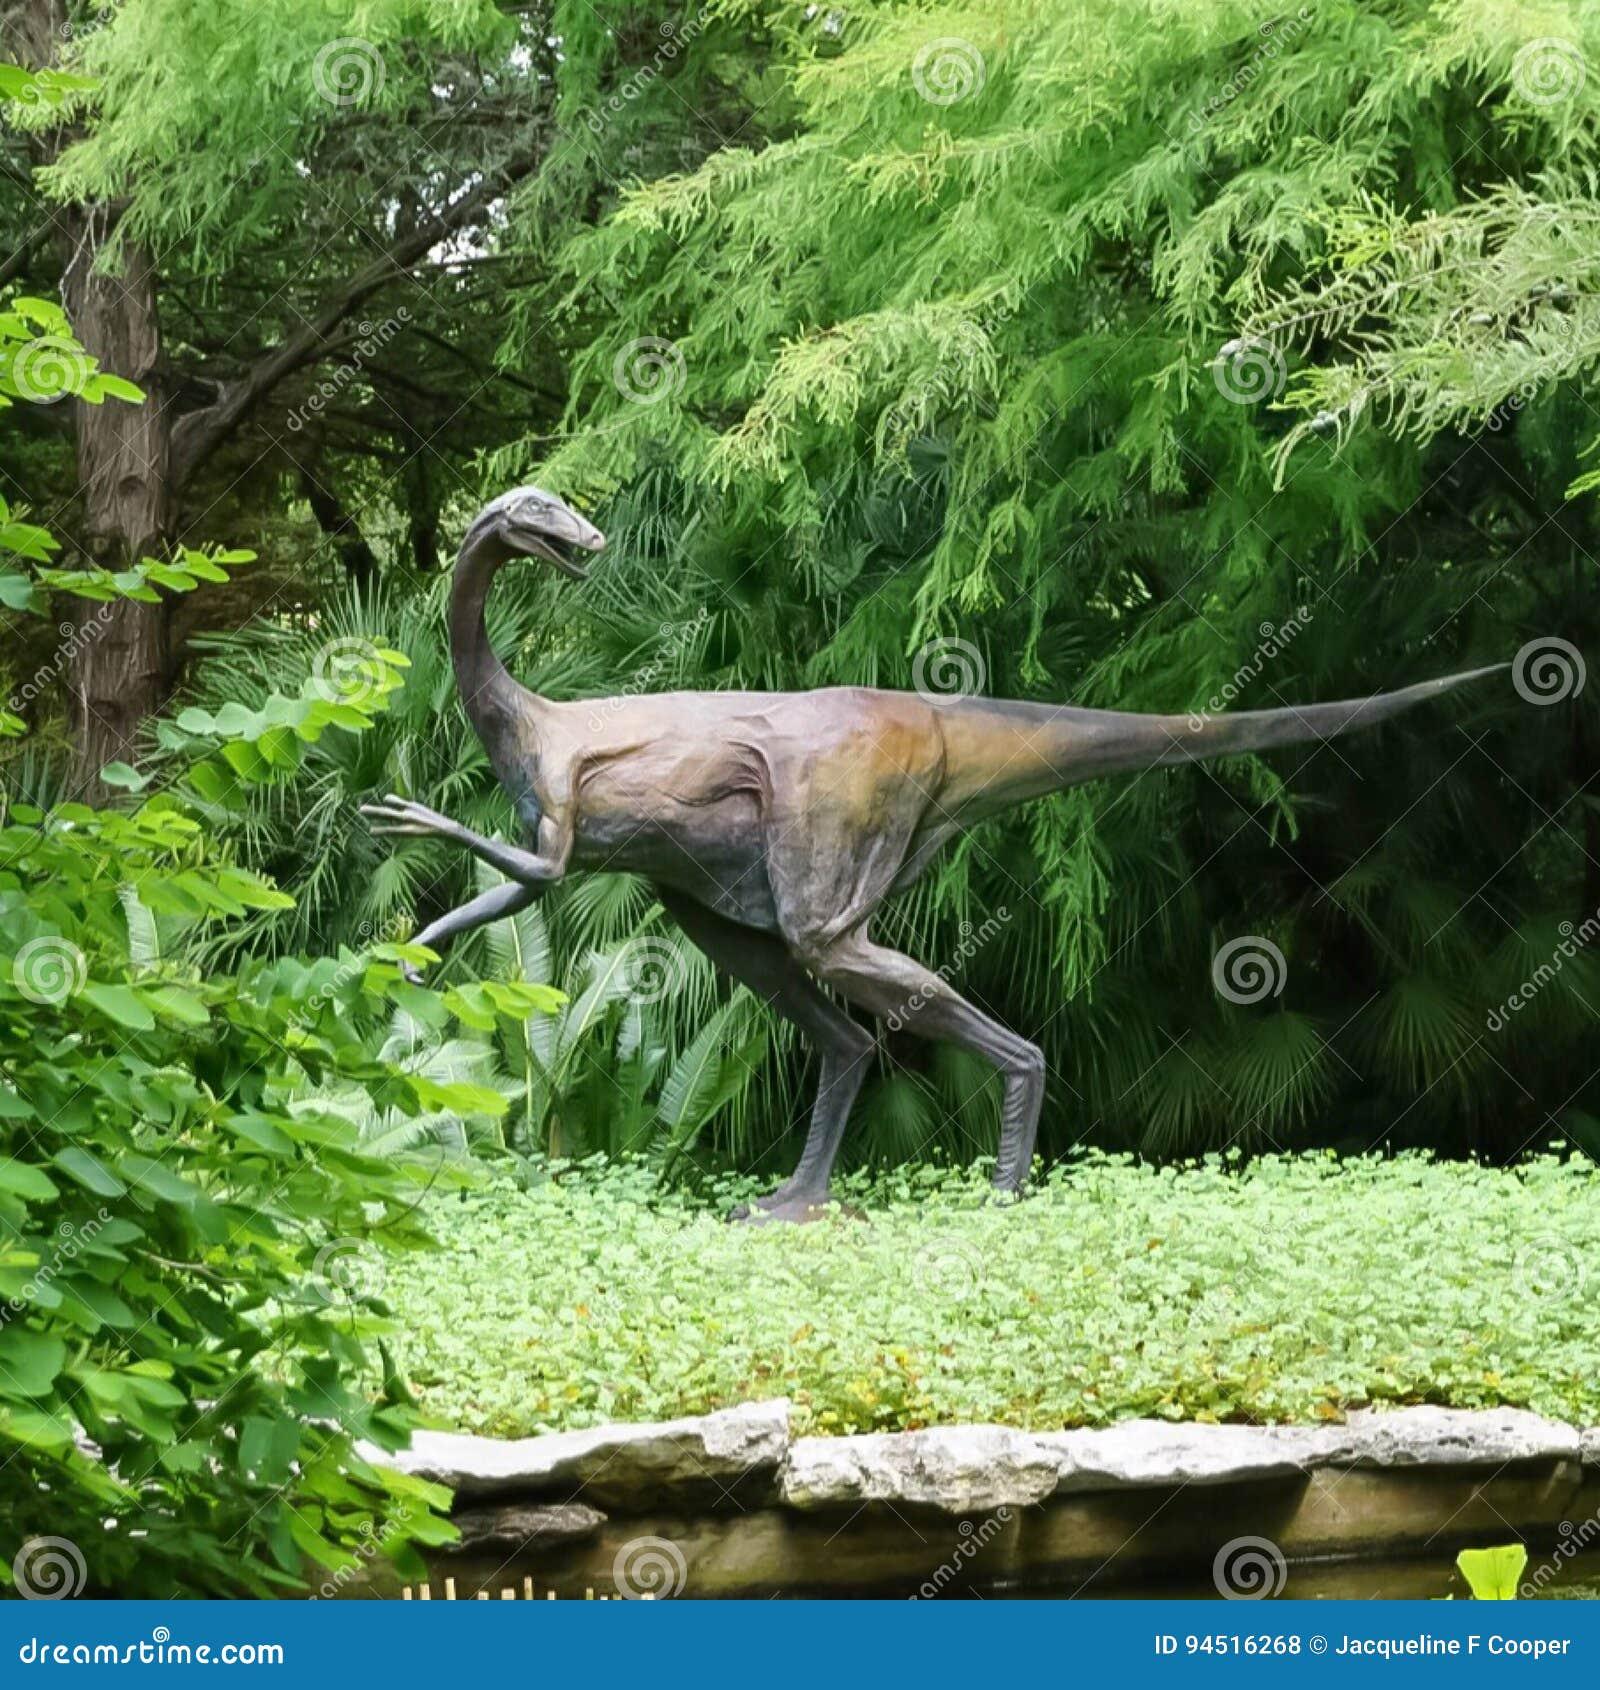 A Dinosaur Statue In Zilker Botanical Garden In Austin Texas